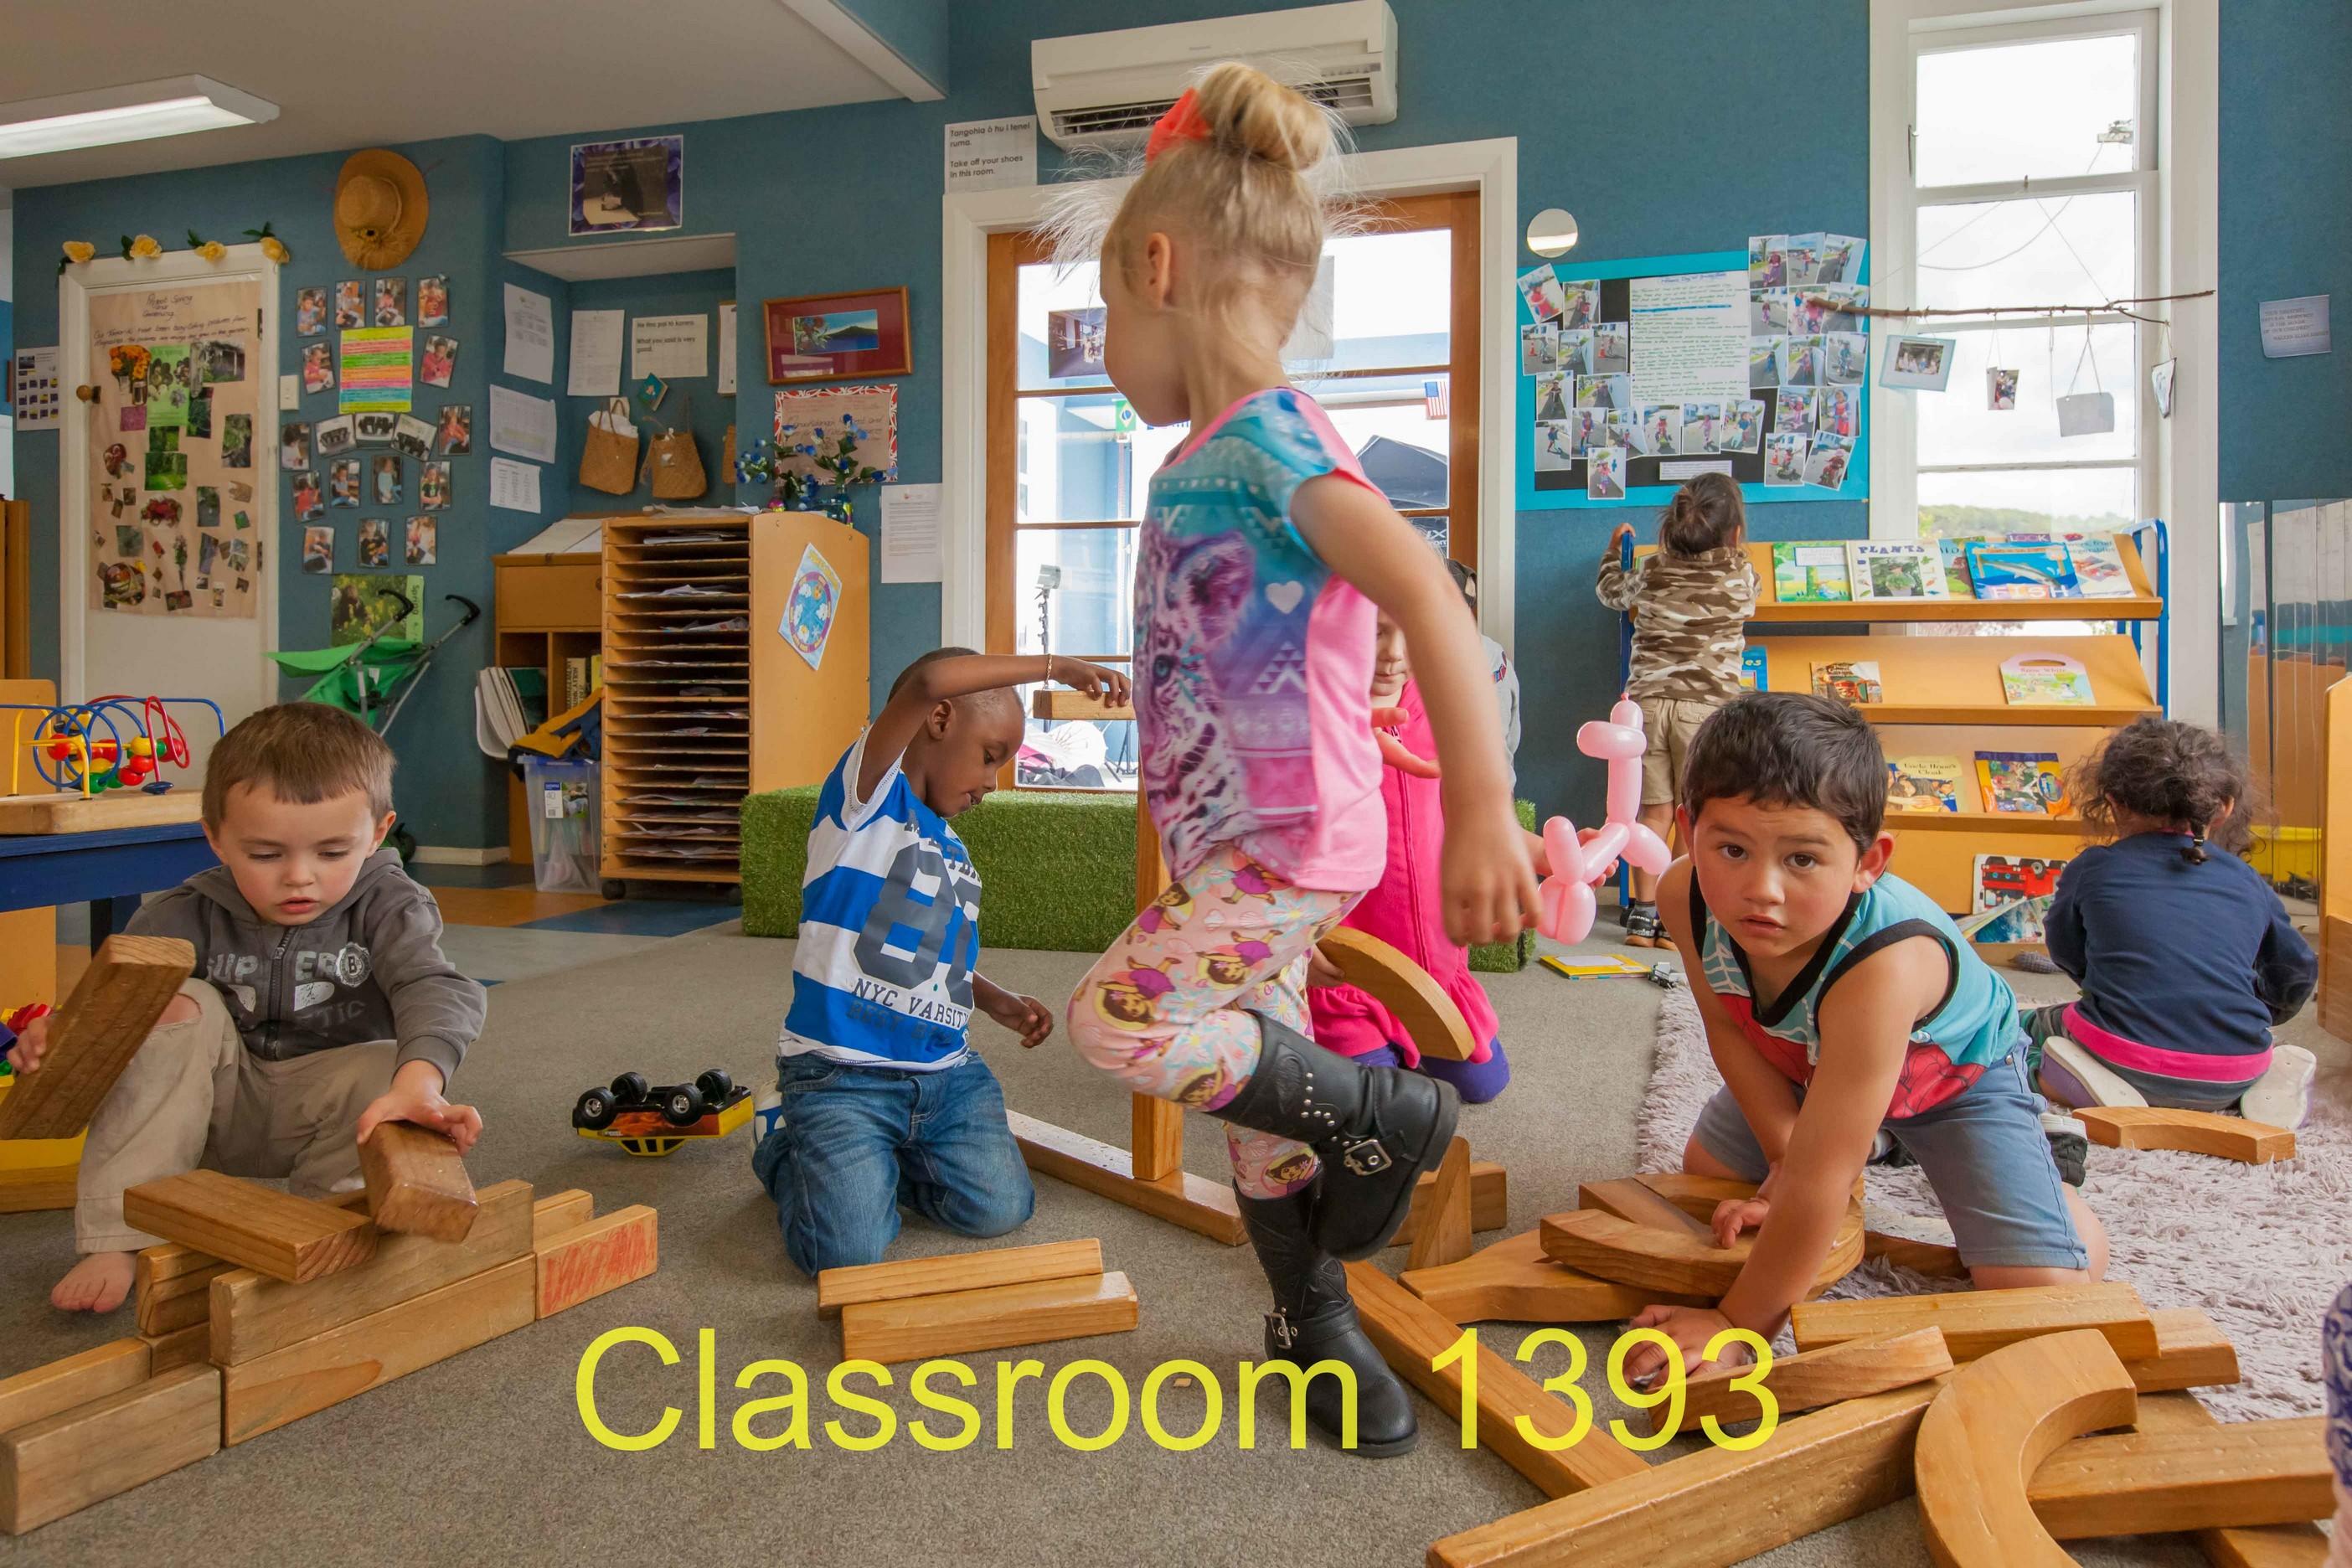 Classroom 1393